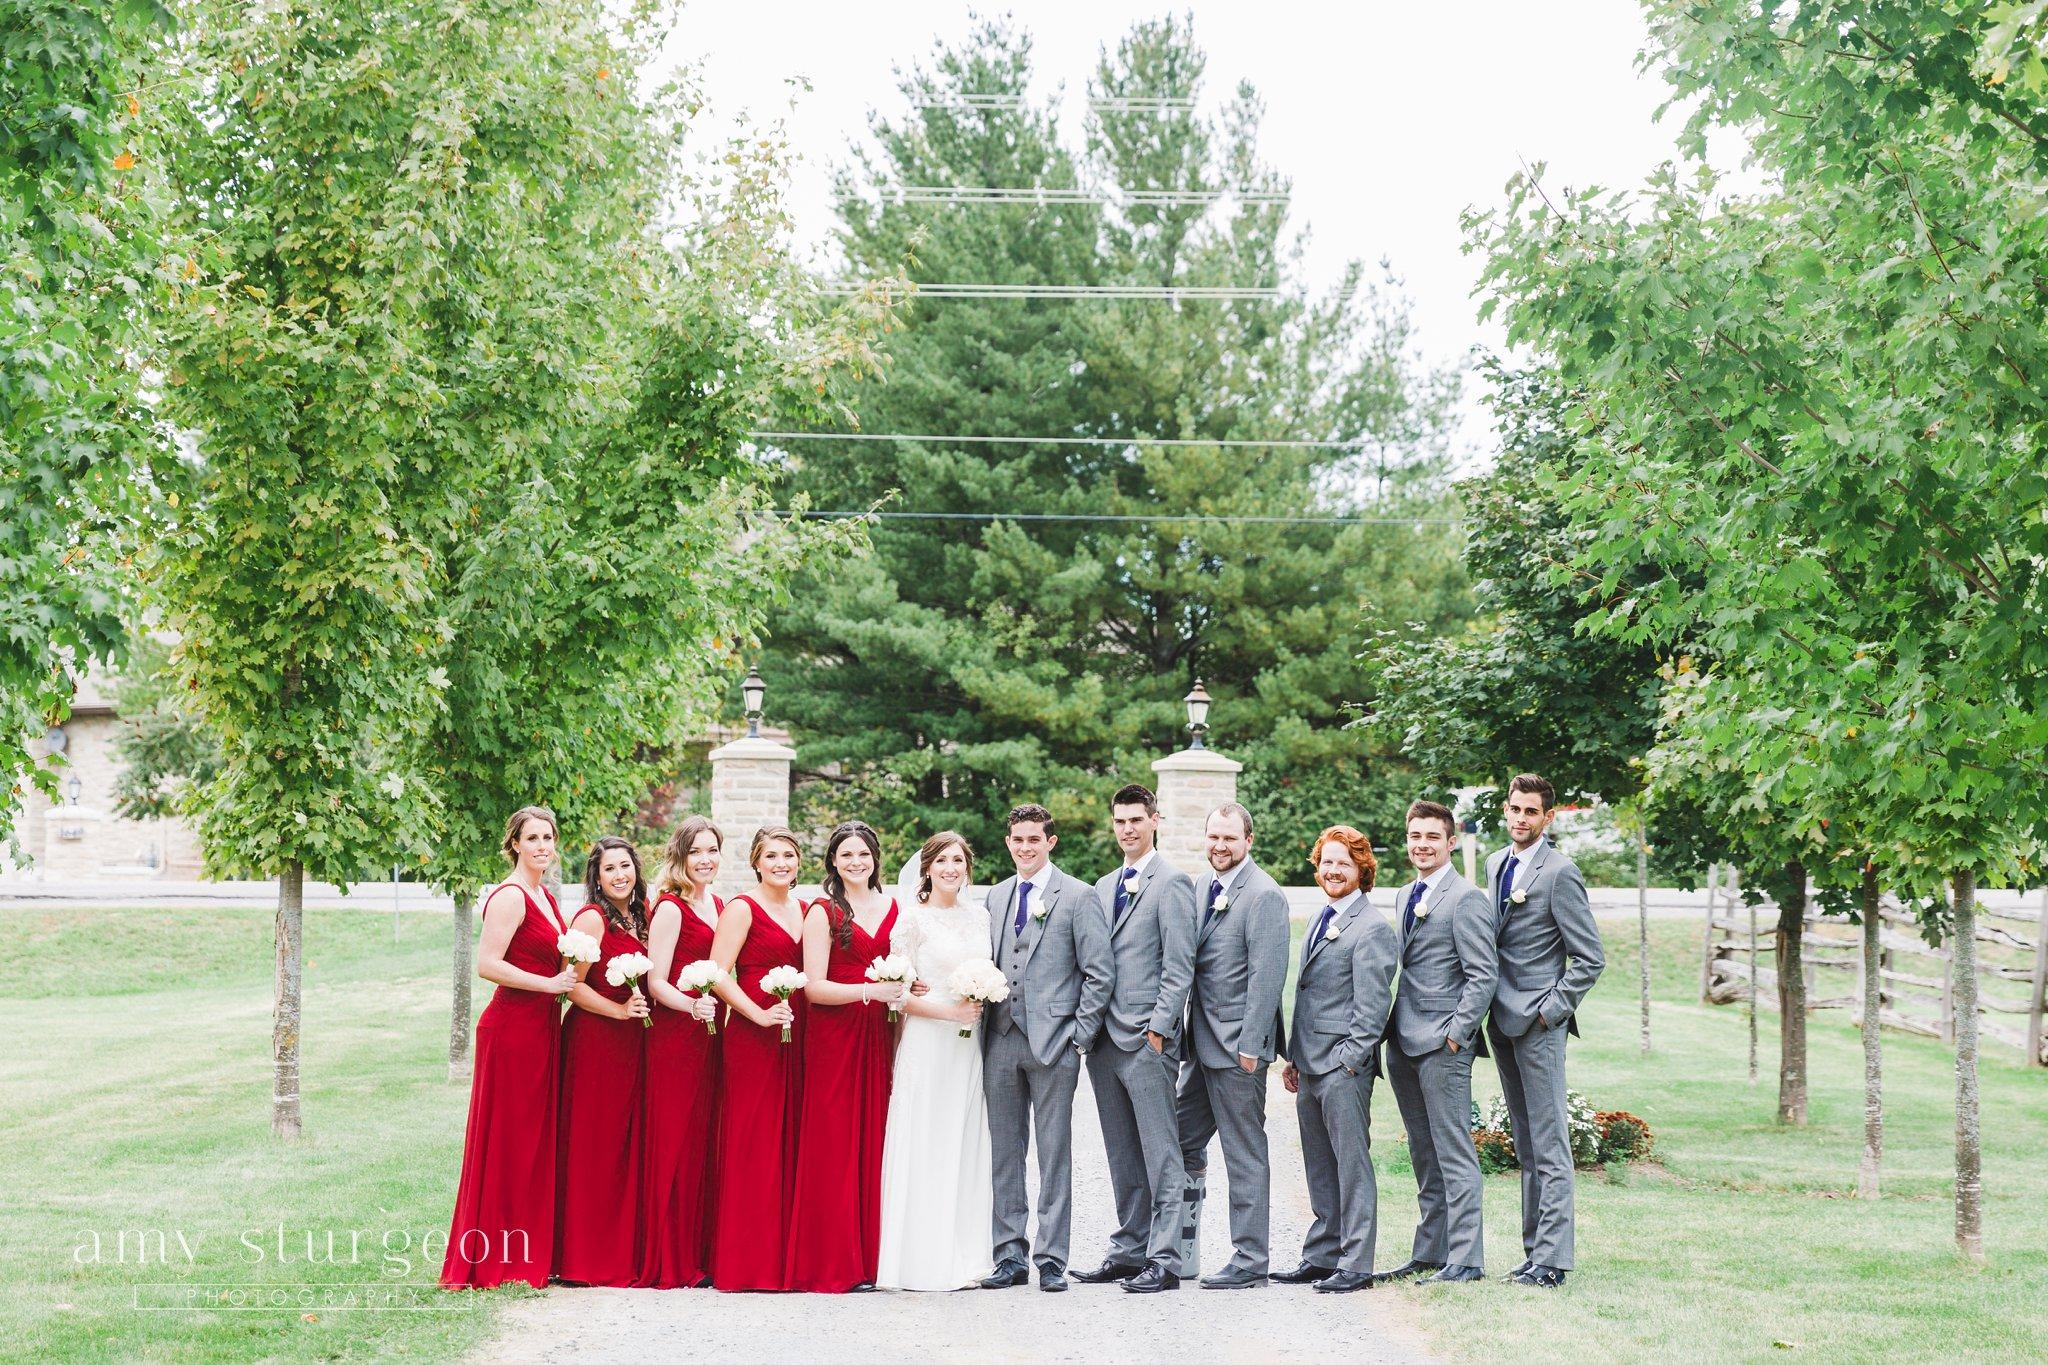 Classic bridal party portrait at the alpaca farm wedding